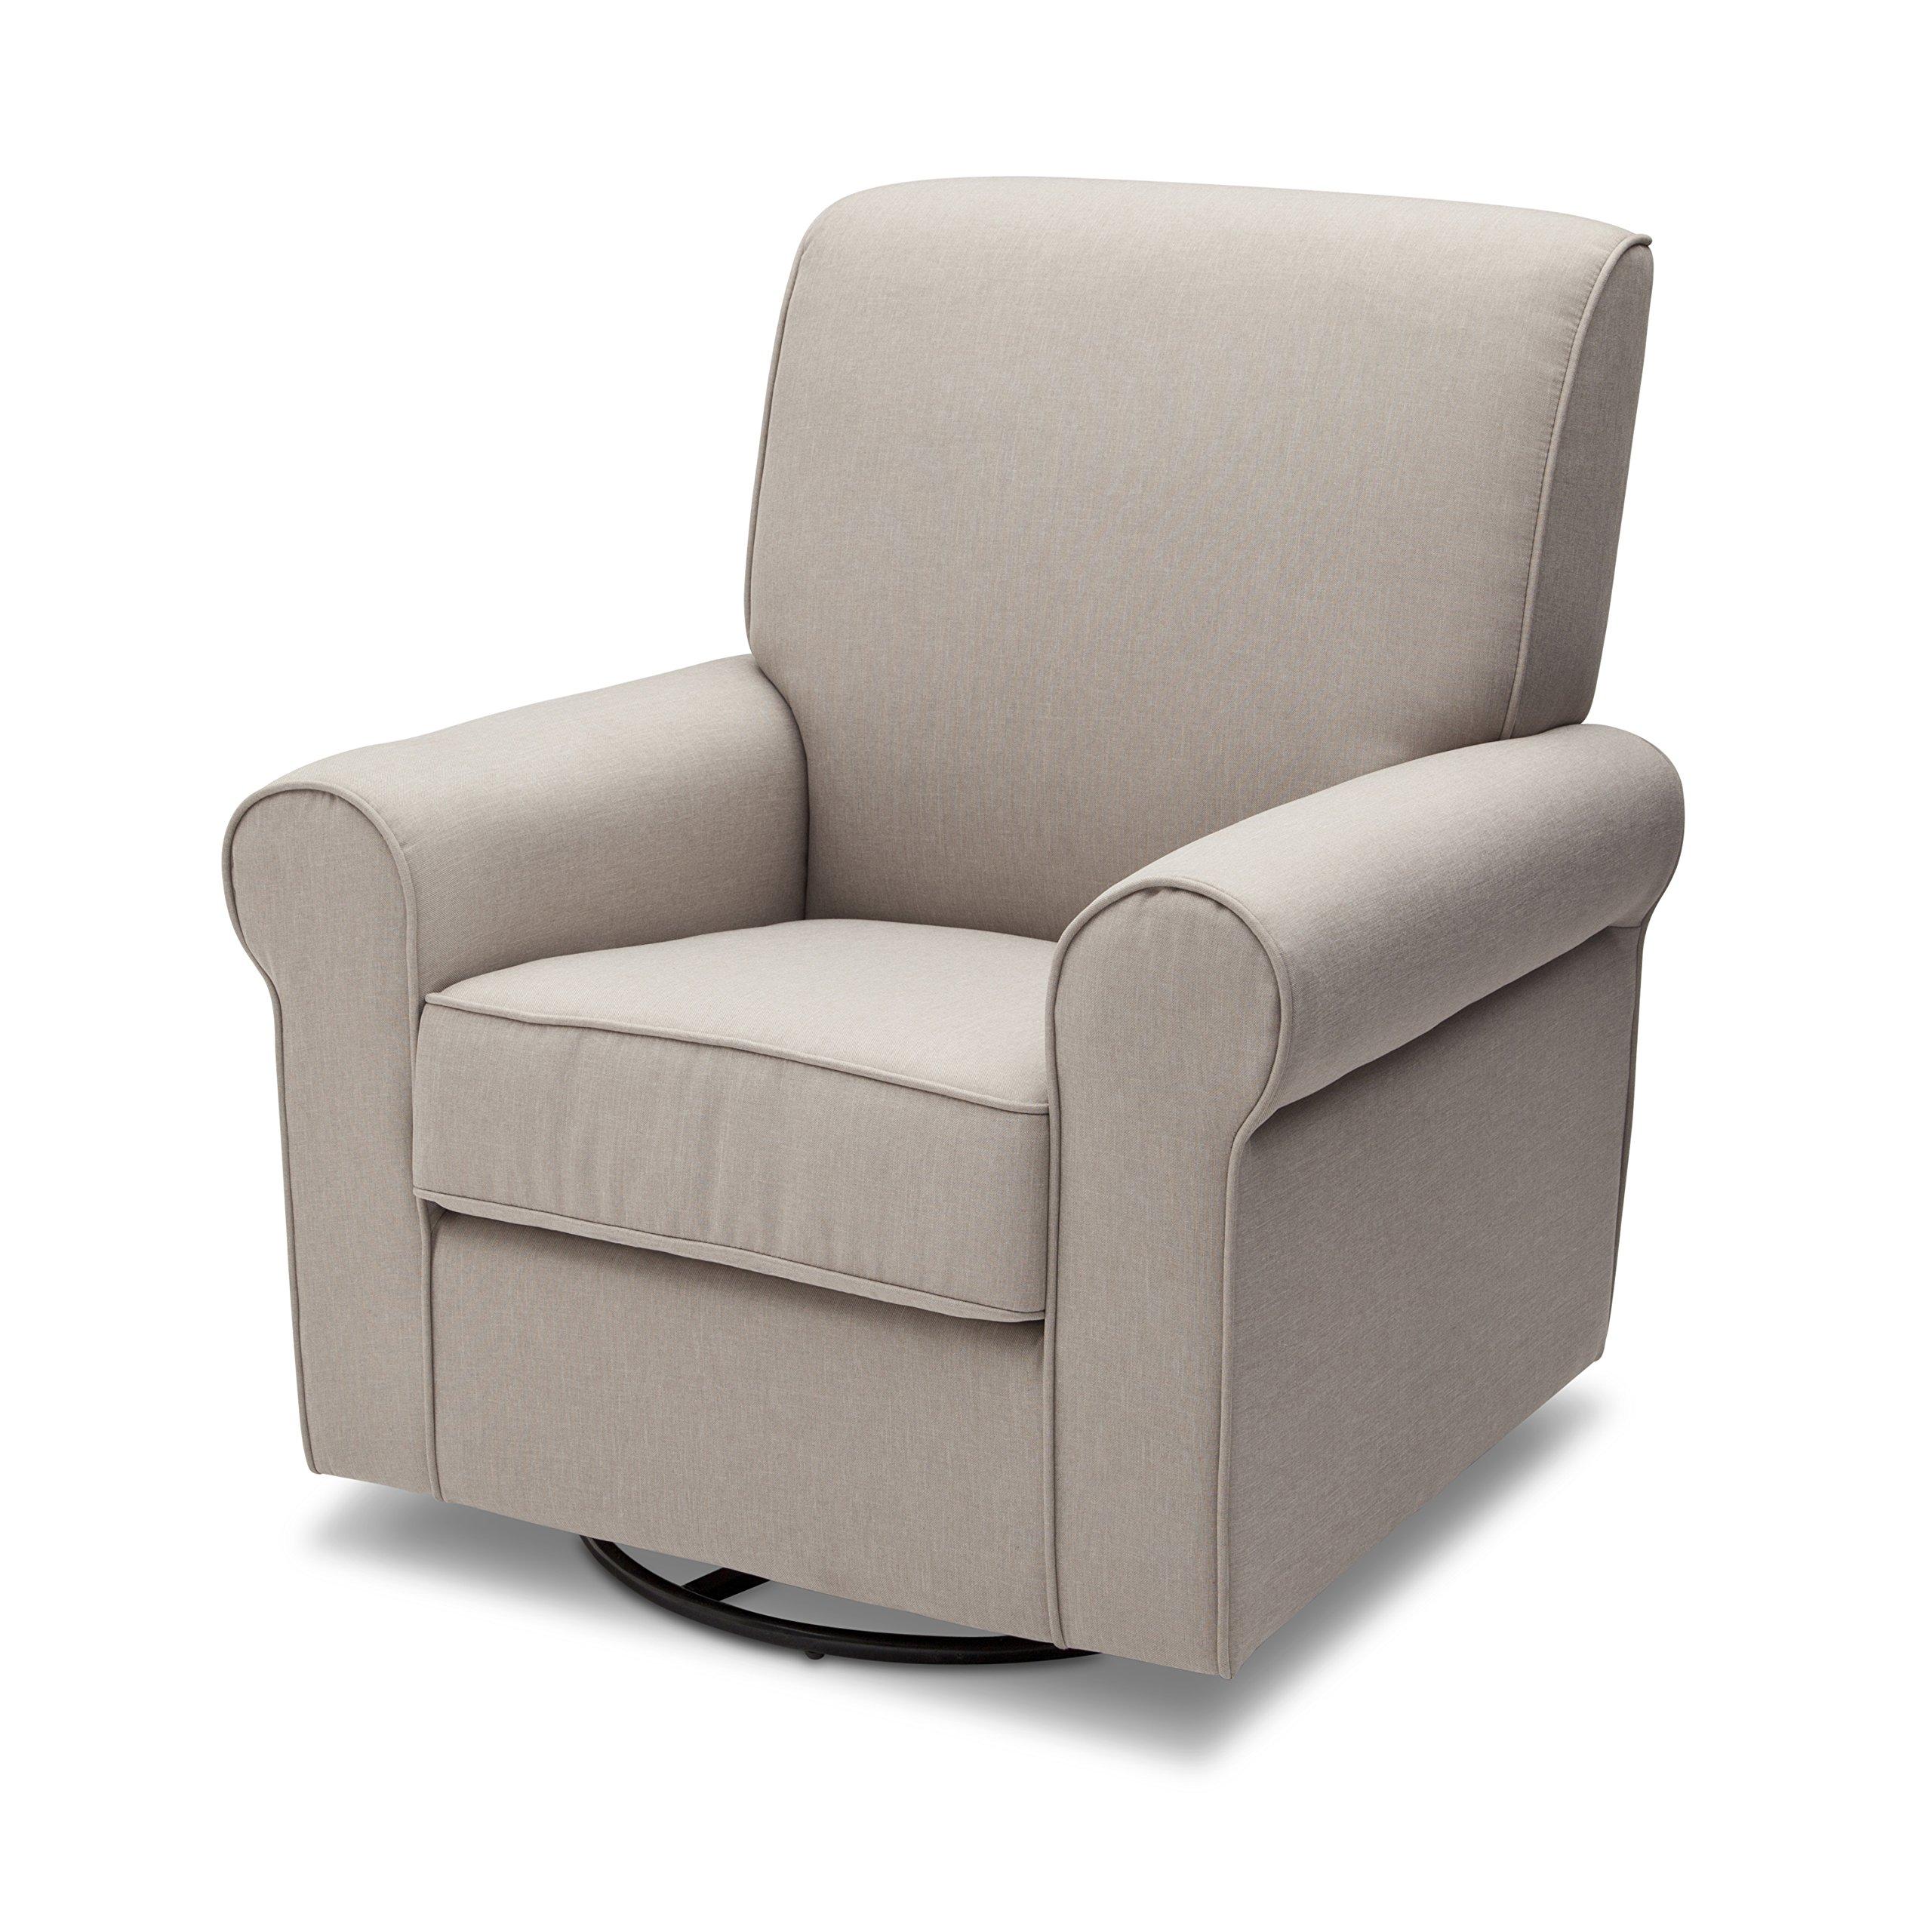 Delta Furniture Avery Upholstered Glider Swivel Rocker Chair, Taupe